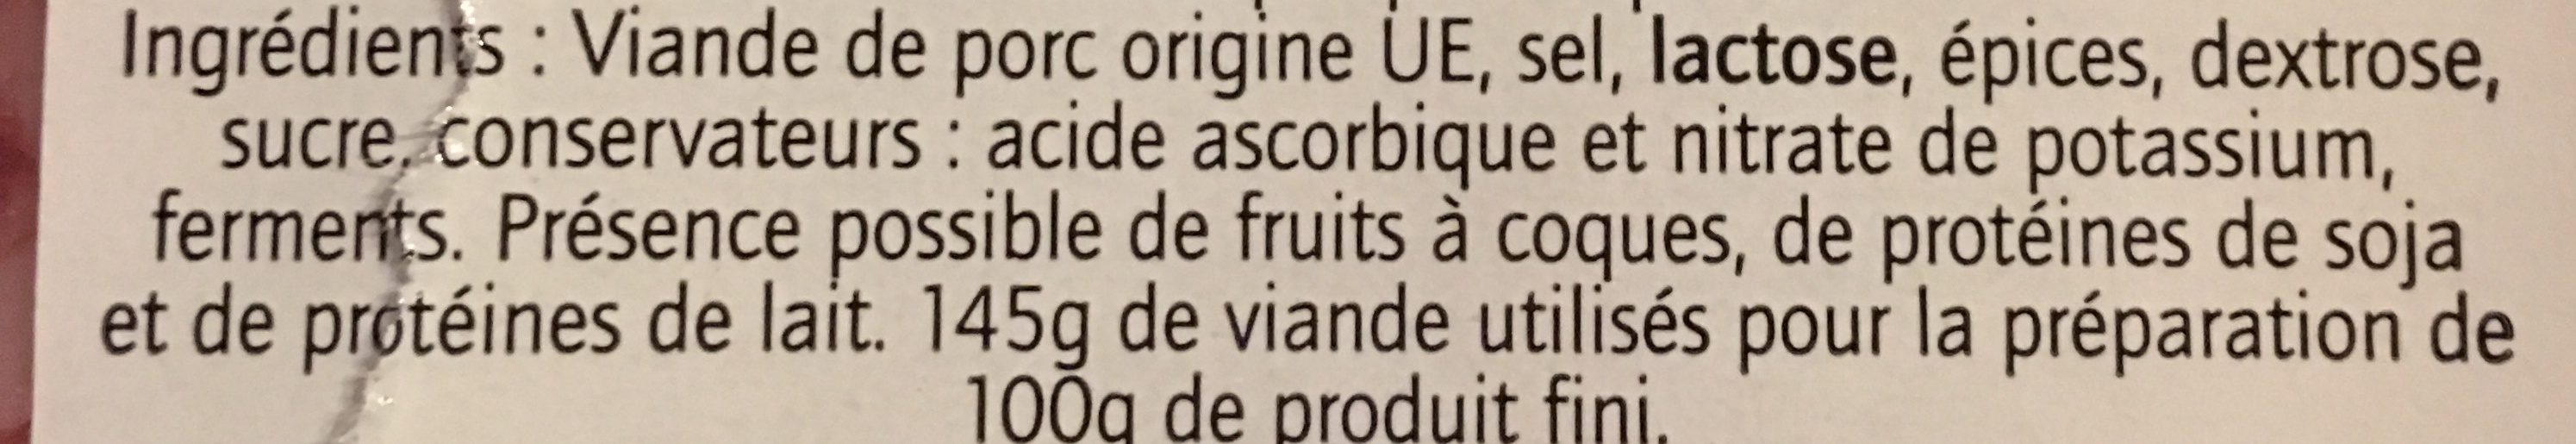 Saucisson nature 24 tranches environ - Ingredienti - fr